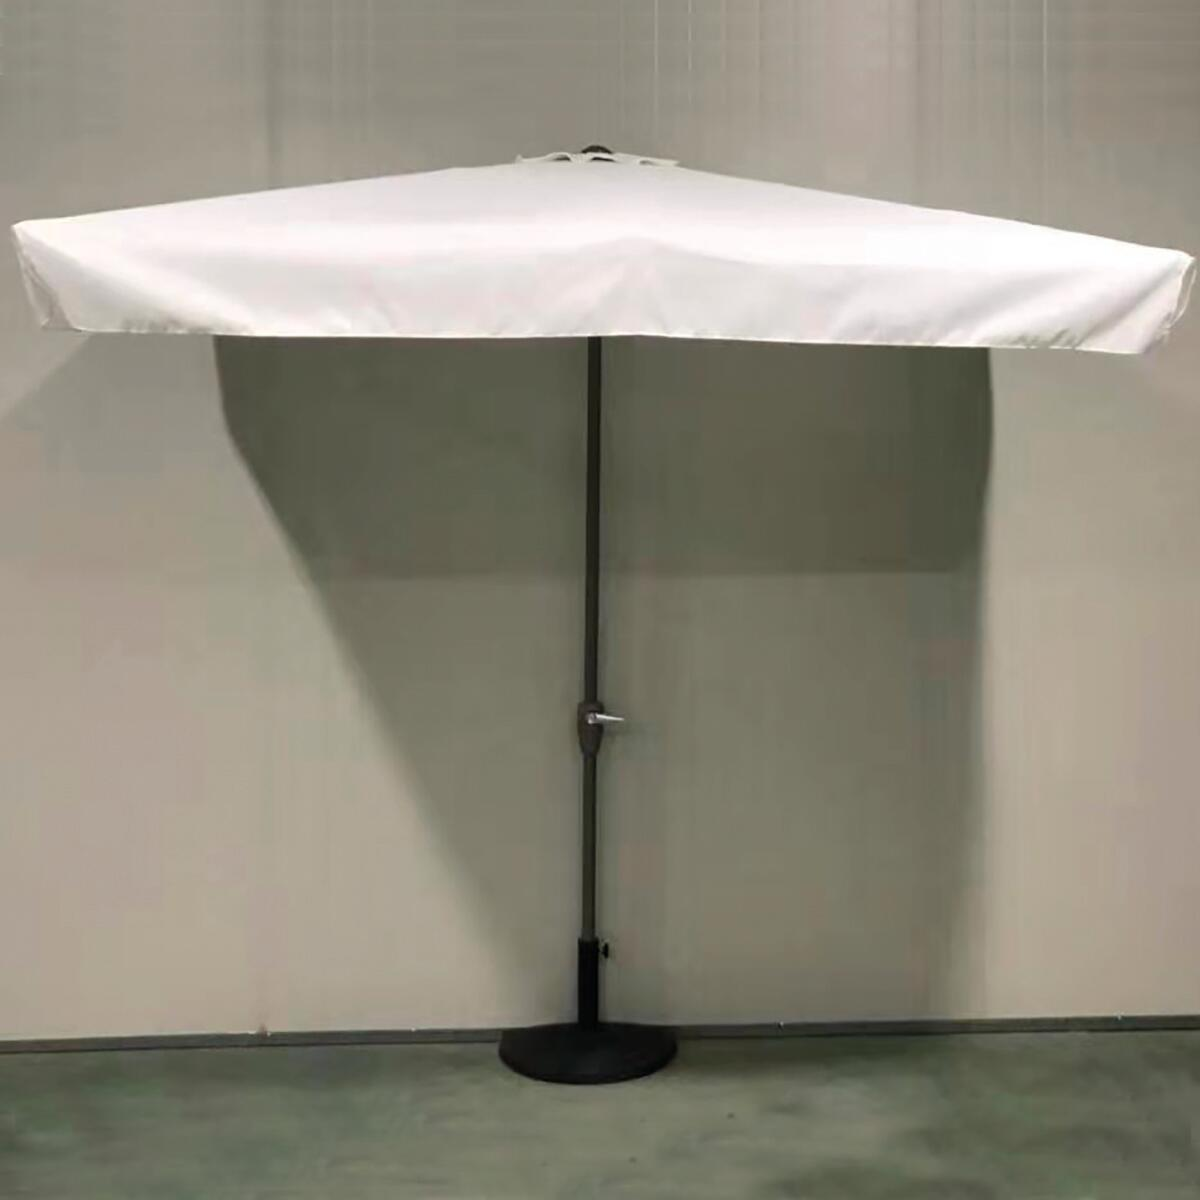 Ombrellone Taormina L 2.3 x P 1.3 m color ecru - 2